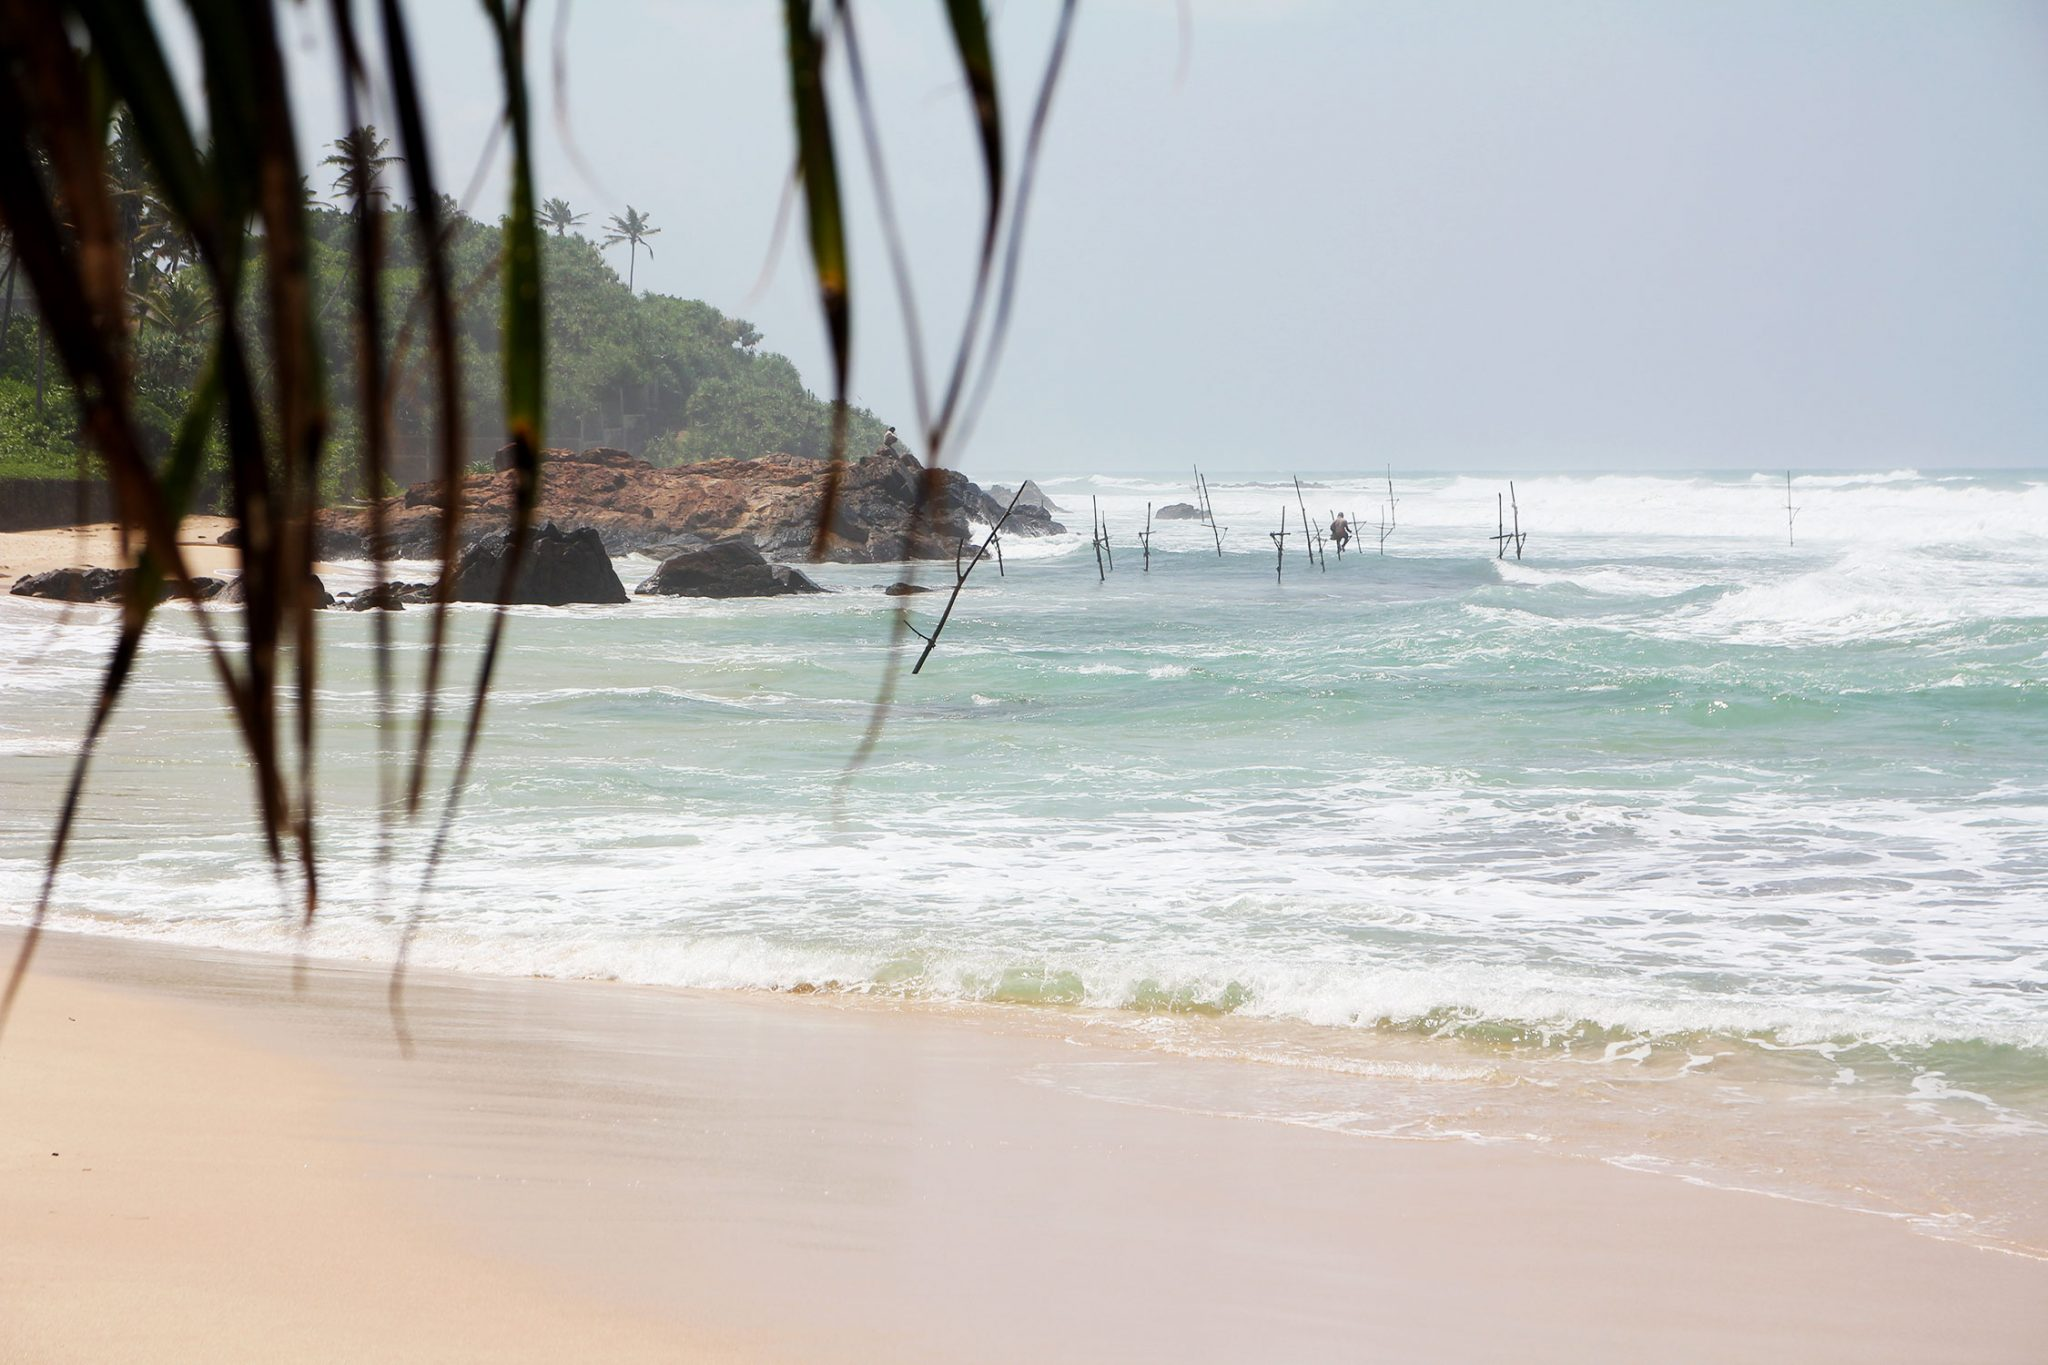 Strand in weligama vissers